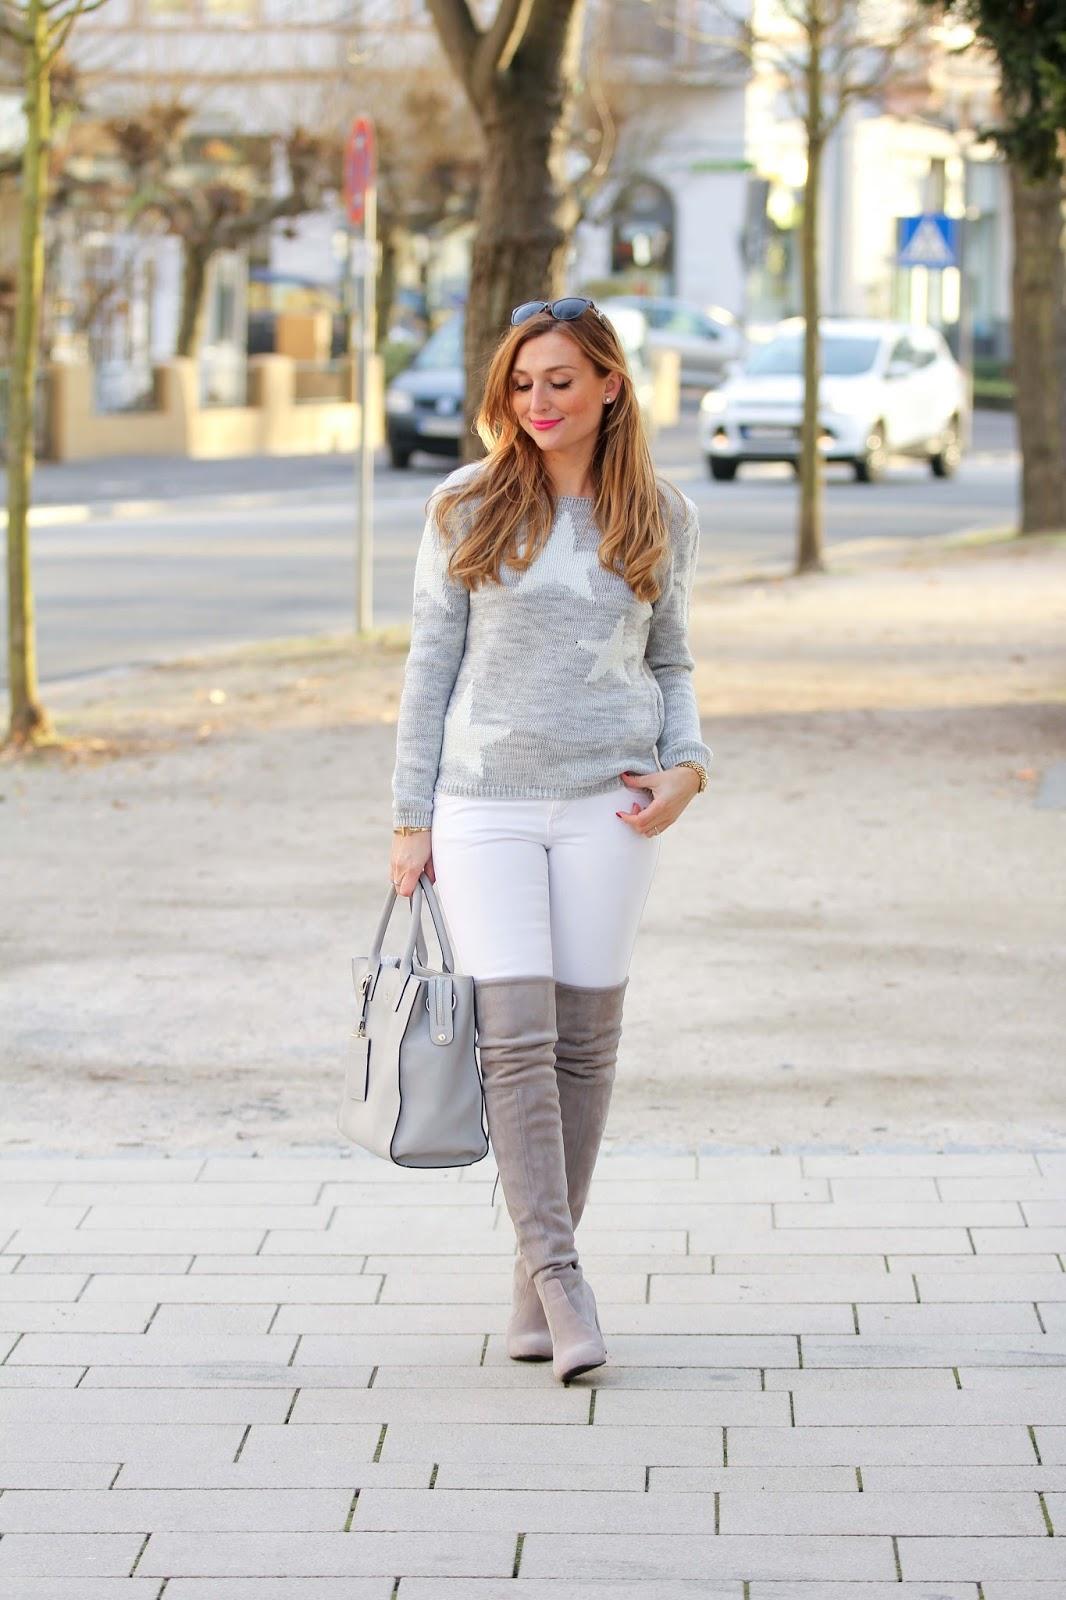 Overknees-Blogger-mit-Overknees-Start.Weitzman-Fashionstylebyjohanna-graue-Overkness-Jessica-Buurman-Jessica-Buurman-Schuhe-weißer-Mantel-streetstyle